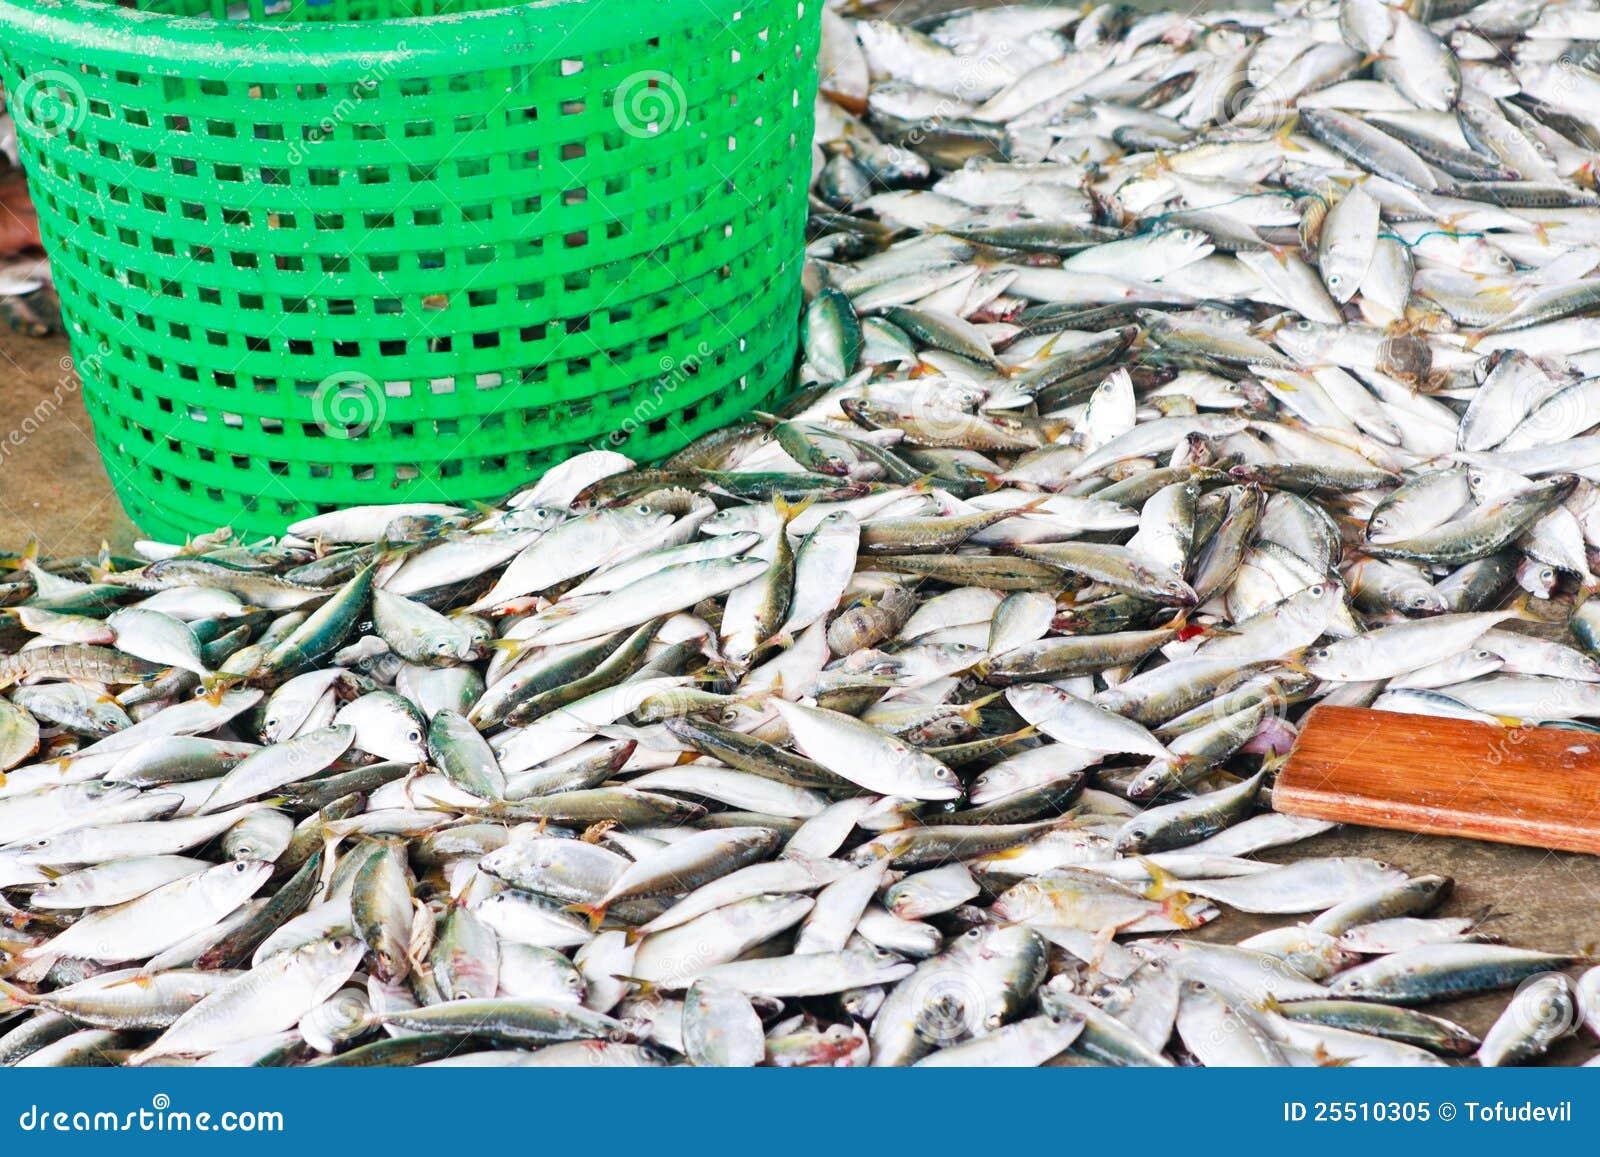 Fresh fish from sea market royalty free stock photo for Nearest fresh fish market